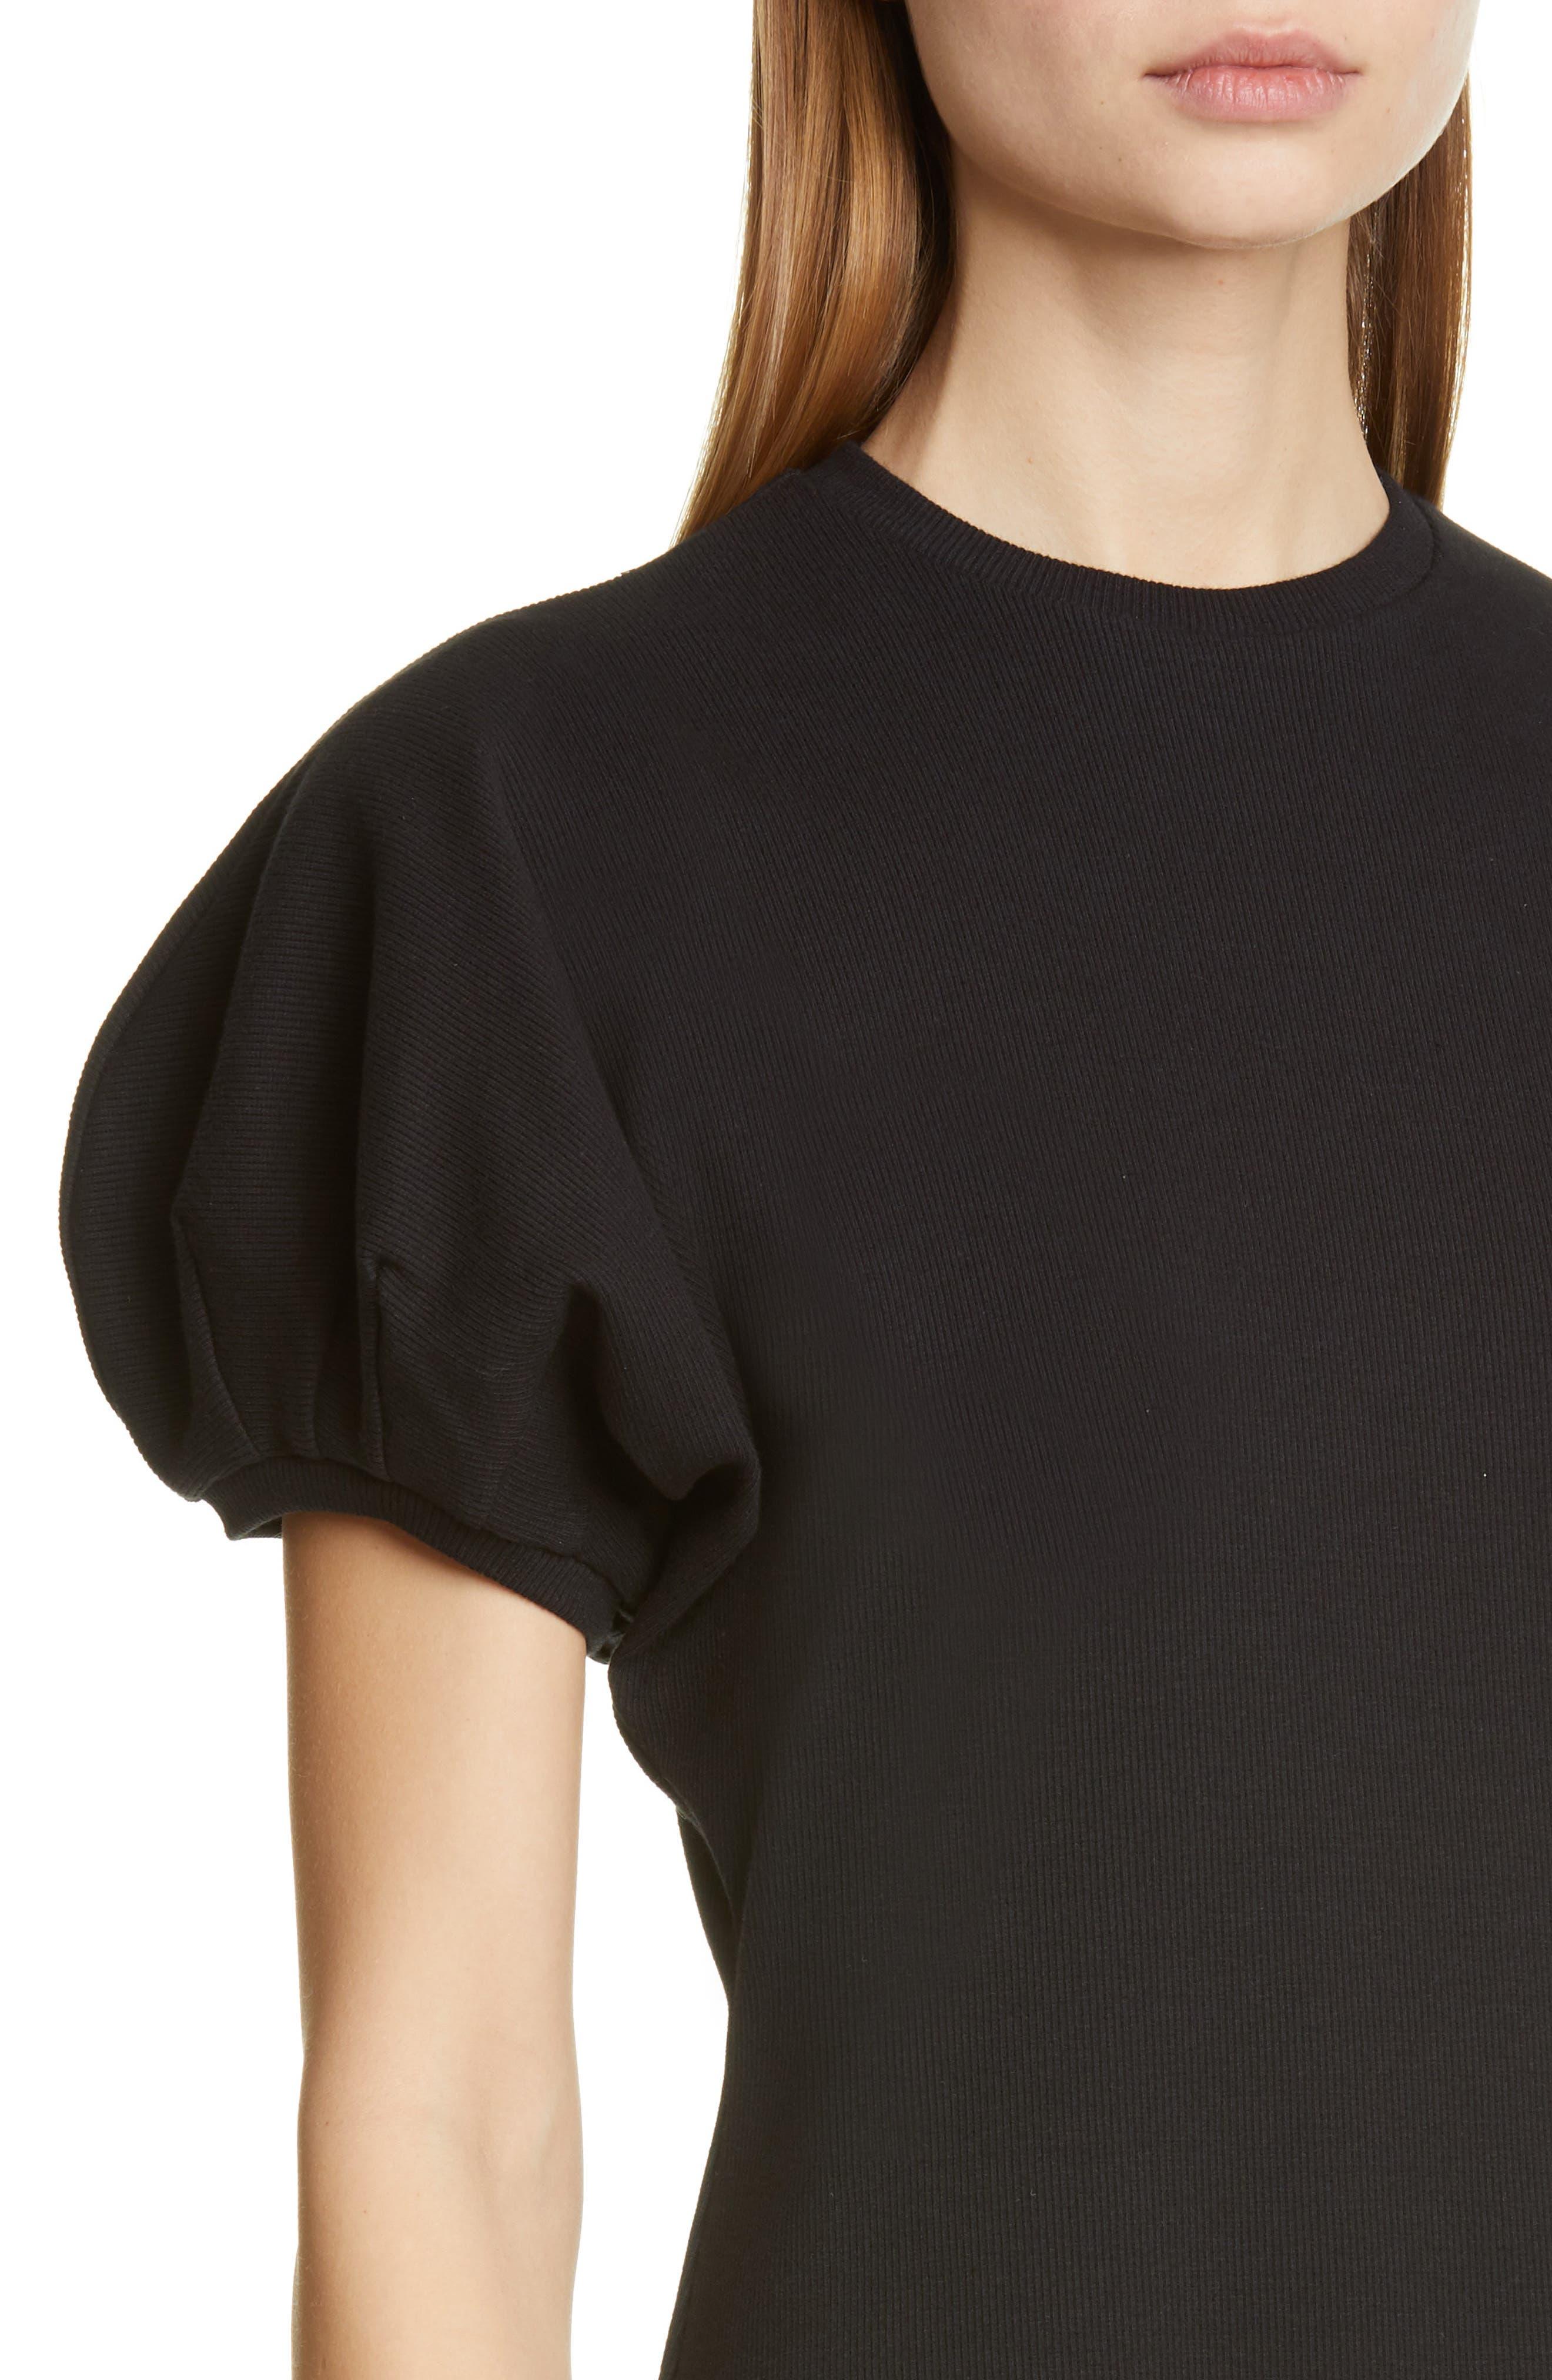 BEAUFILLE, Leda Puff Sleeve Dress, Alternate thumbnail 4, color, BLACK